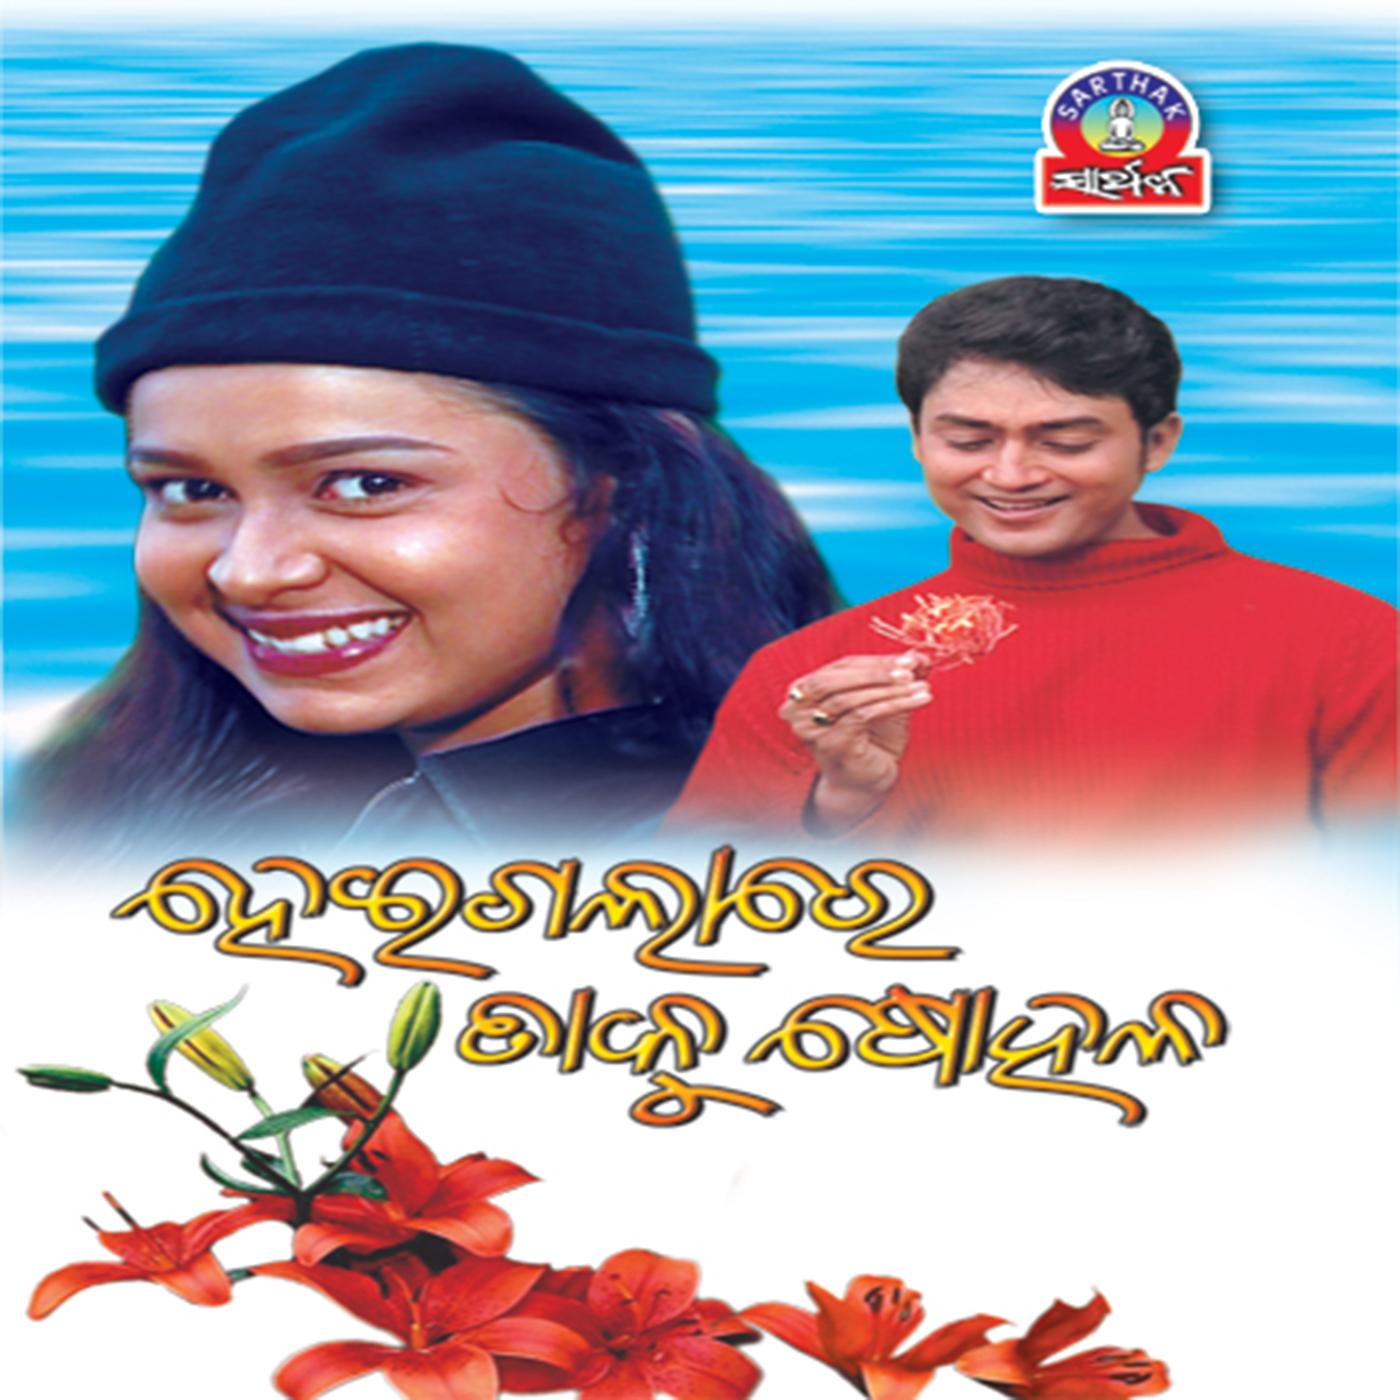 Baula Makera Dekhalo Dekha Kaincha Kemichi Kadhichi Beka (Ira Mohanty, Pranati)